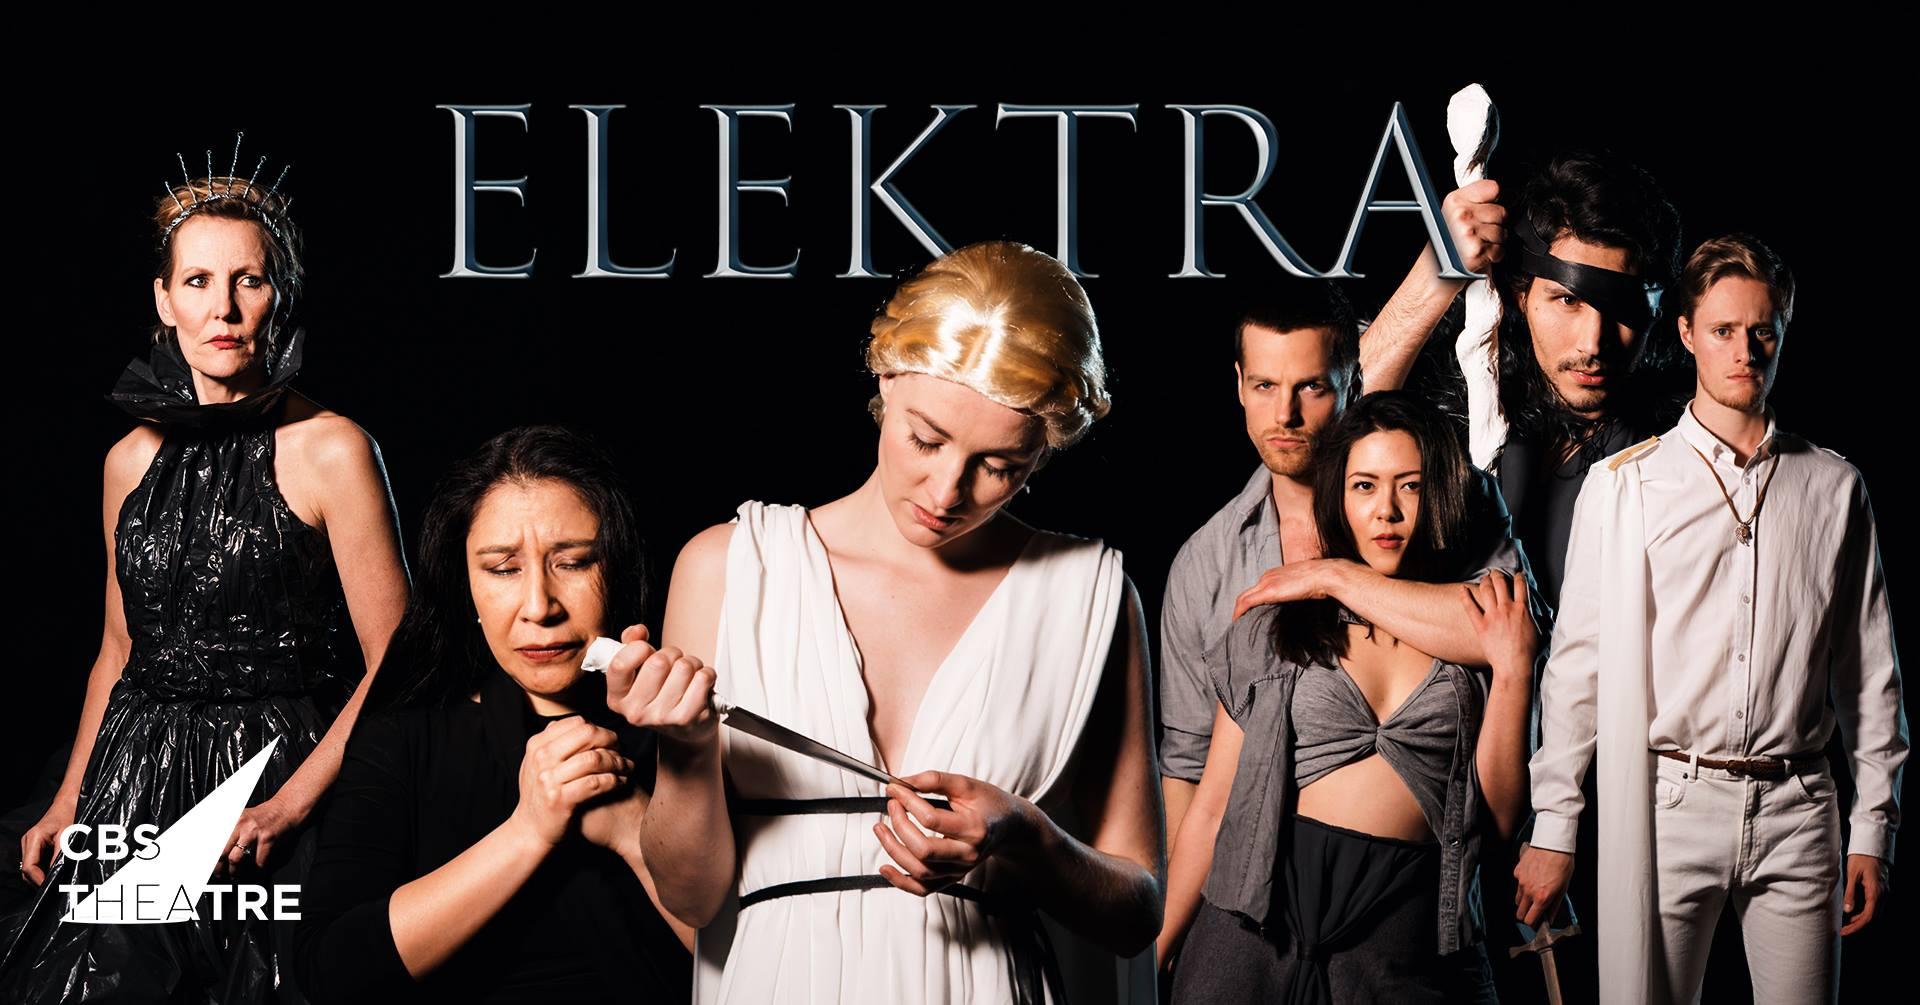 Anmeldelse: Elektra, House of International Theatre, CBS Theatre